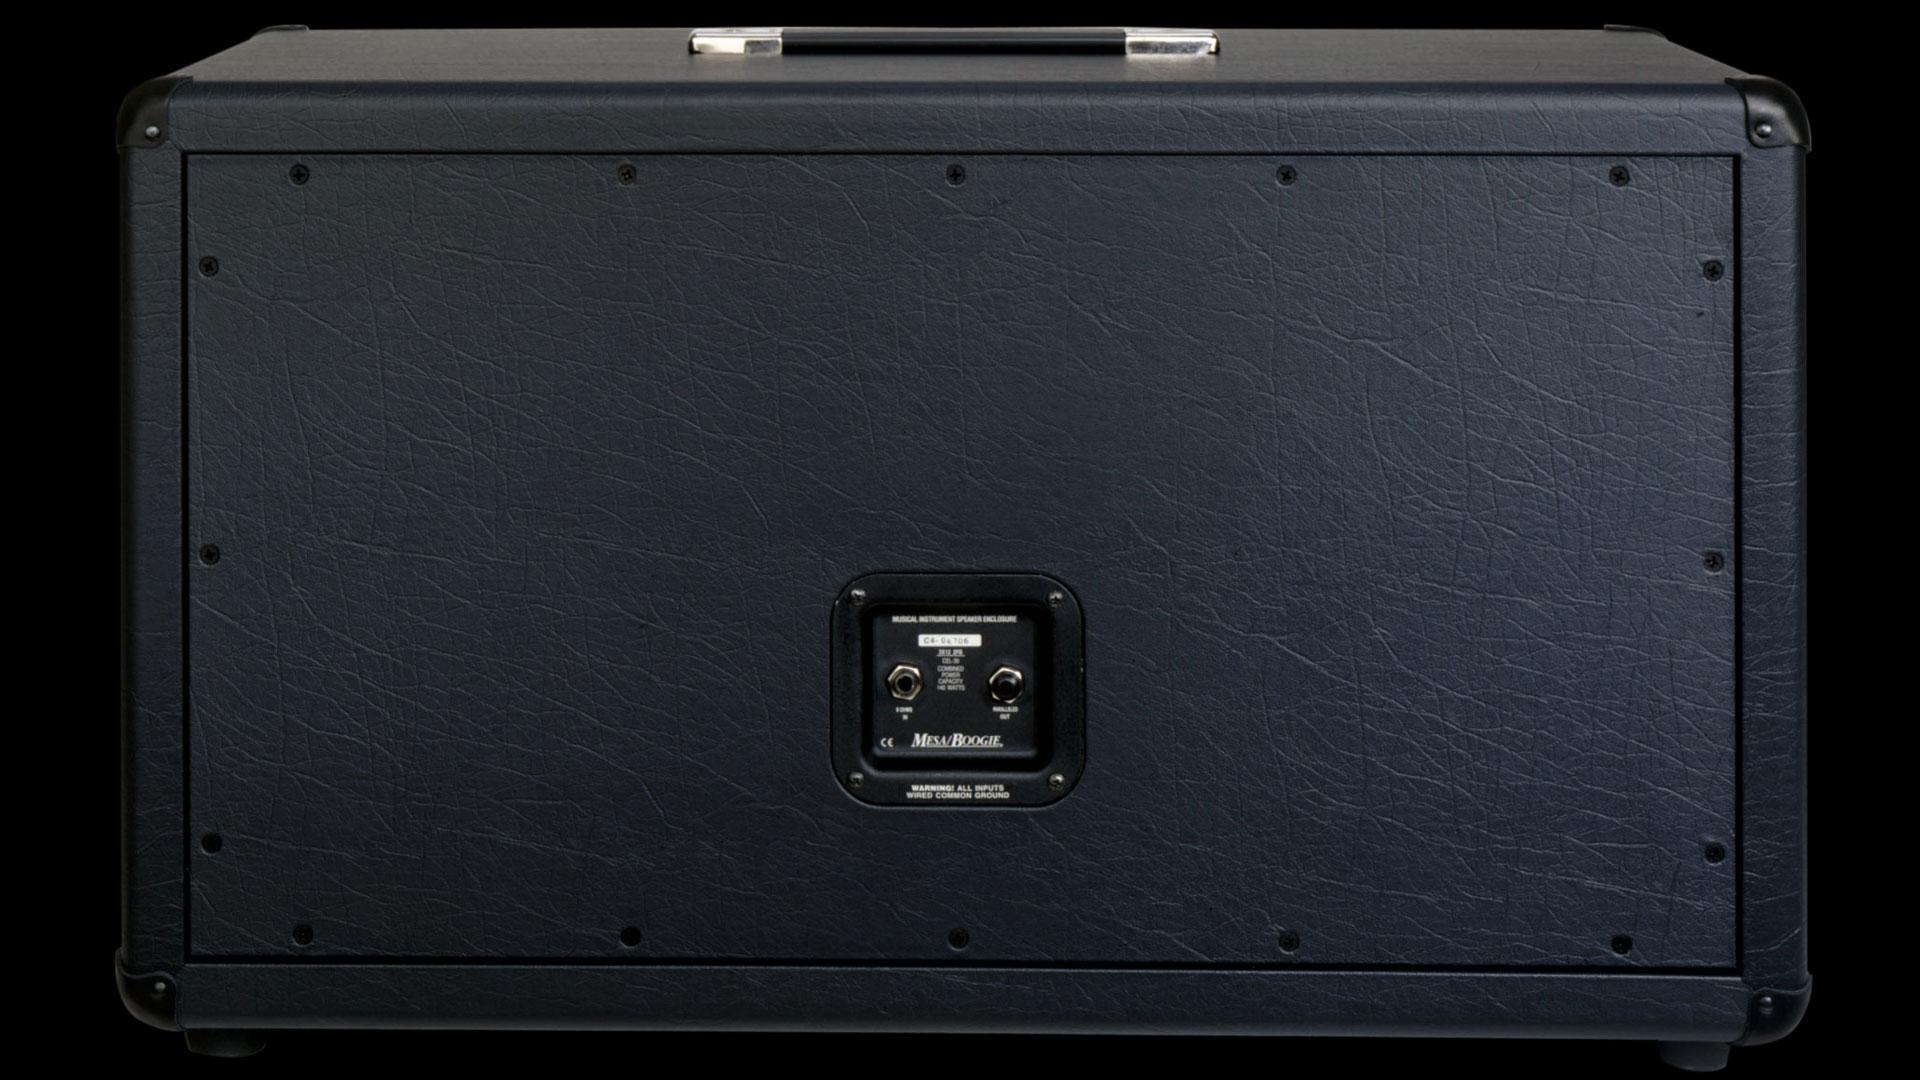 2x12 rectifier horizontal guitar amplifier cabinet mesa boogie rectifier cabinets 2x12 recto horizontal [ 1920 x 1080 Pixel ]